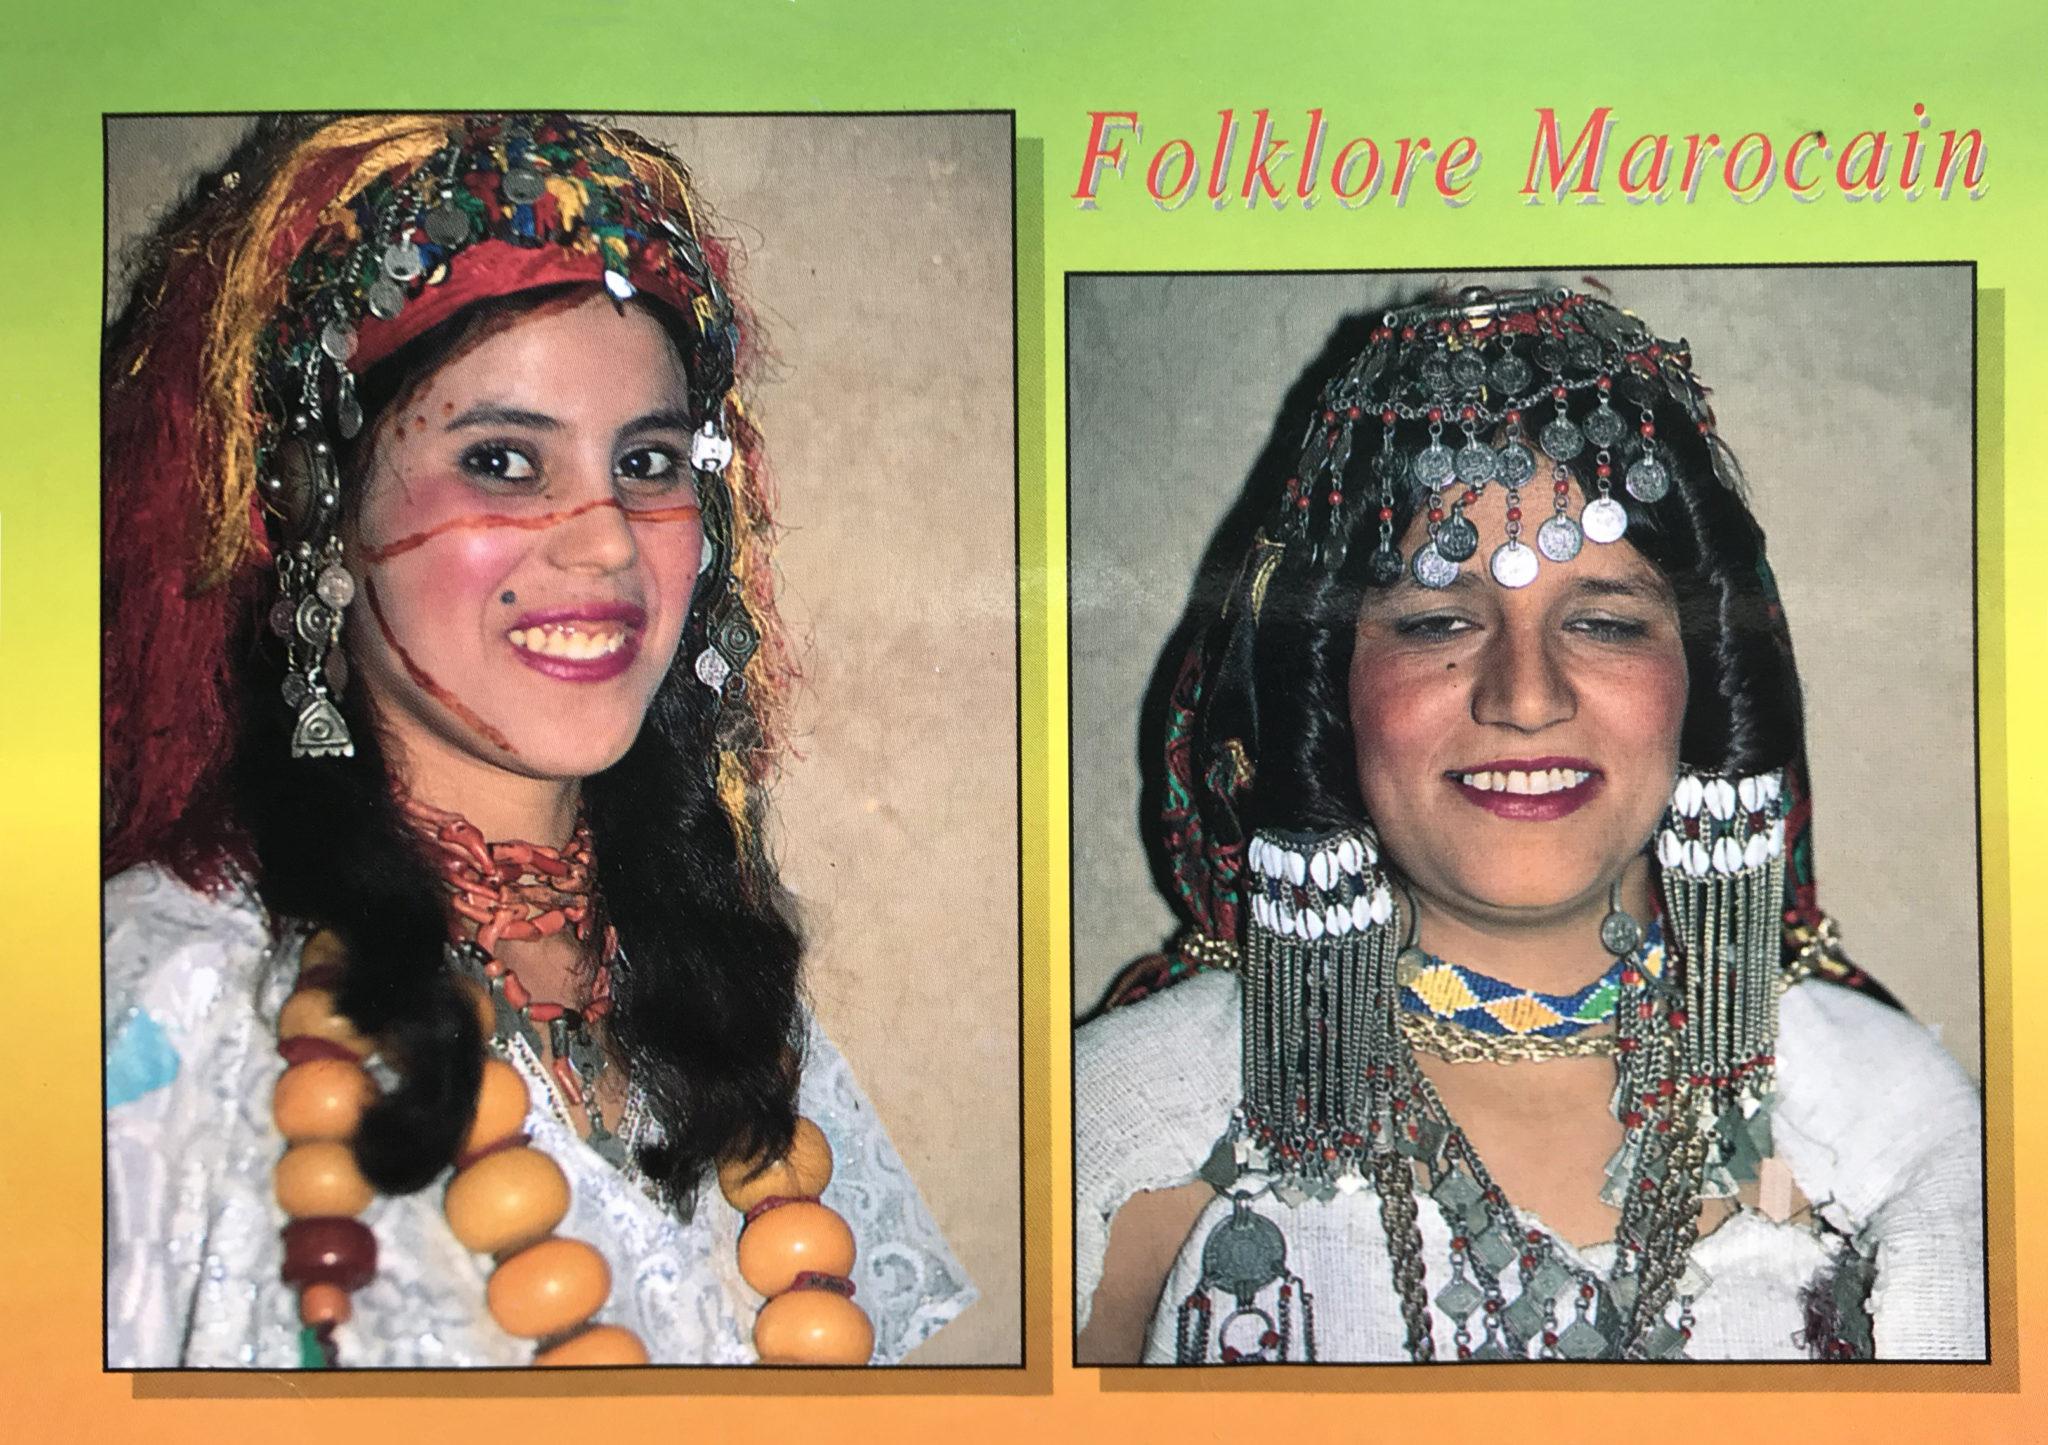 Folklore Marocain